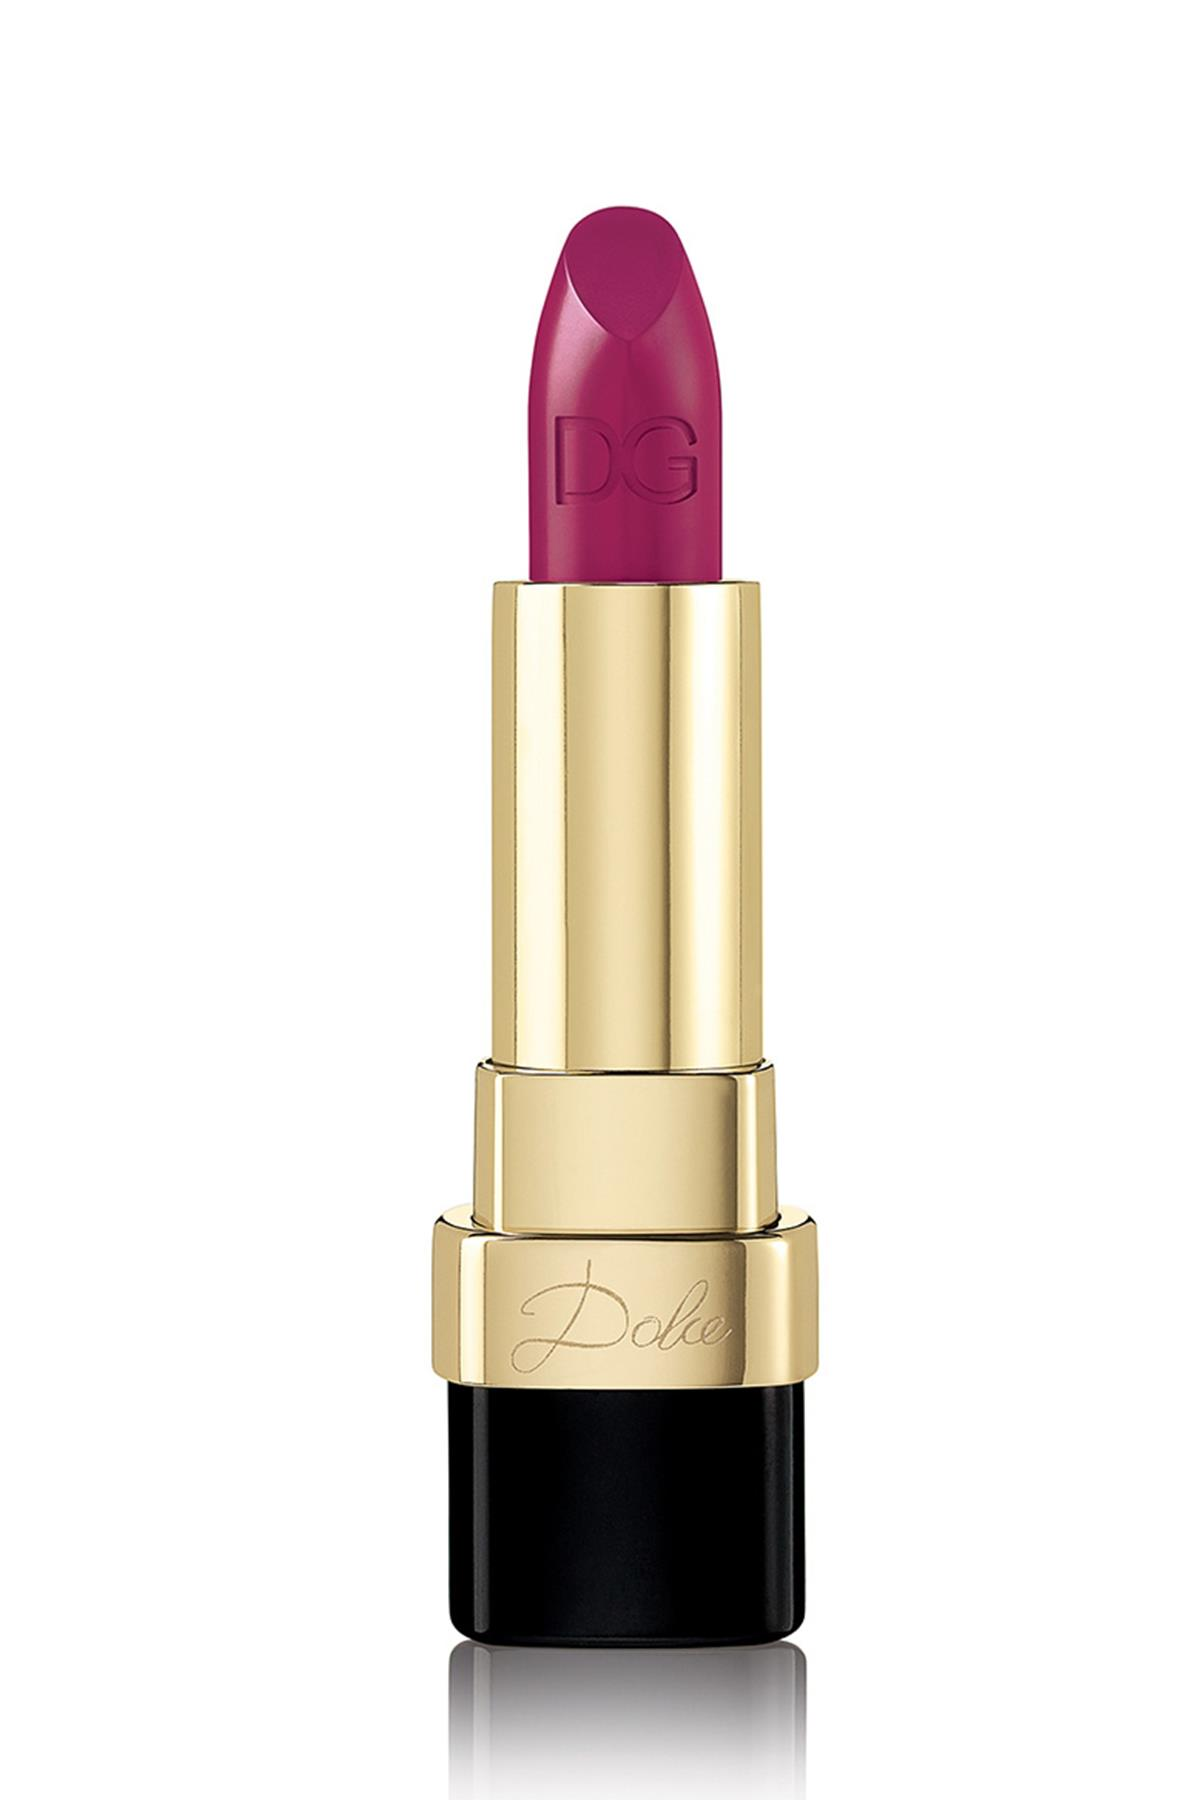 Dolce Gabbana Dolce Matte Lipstick 645 Orchid Ruj